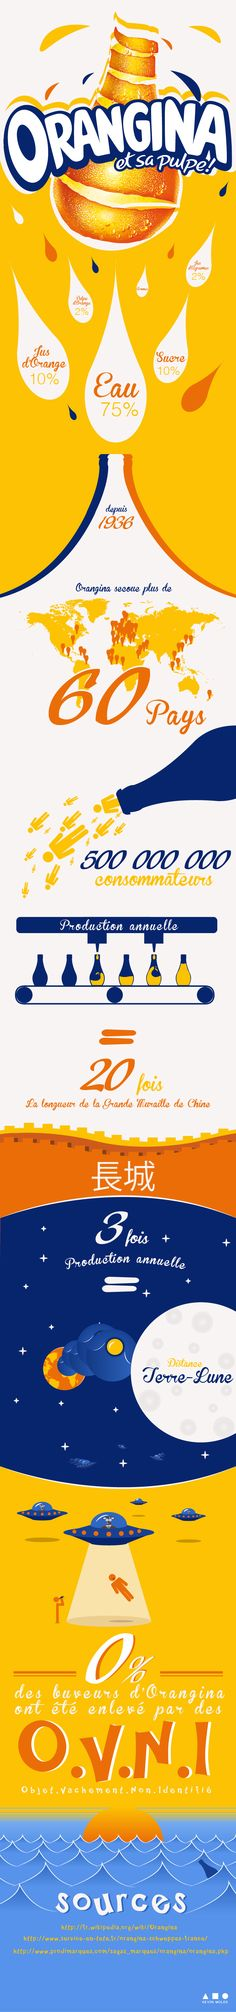 Infographie Orangina